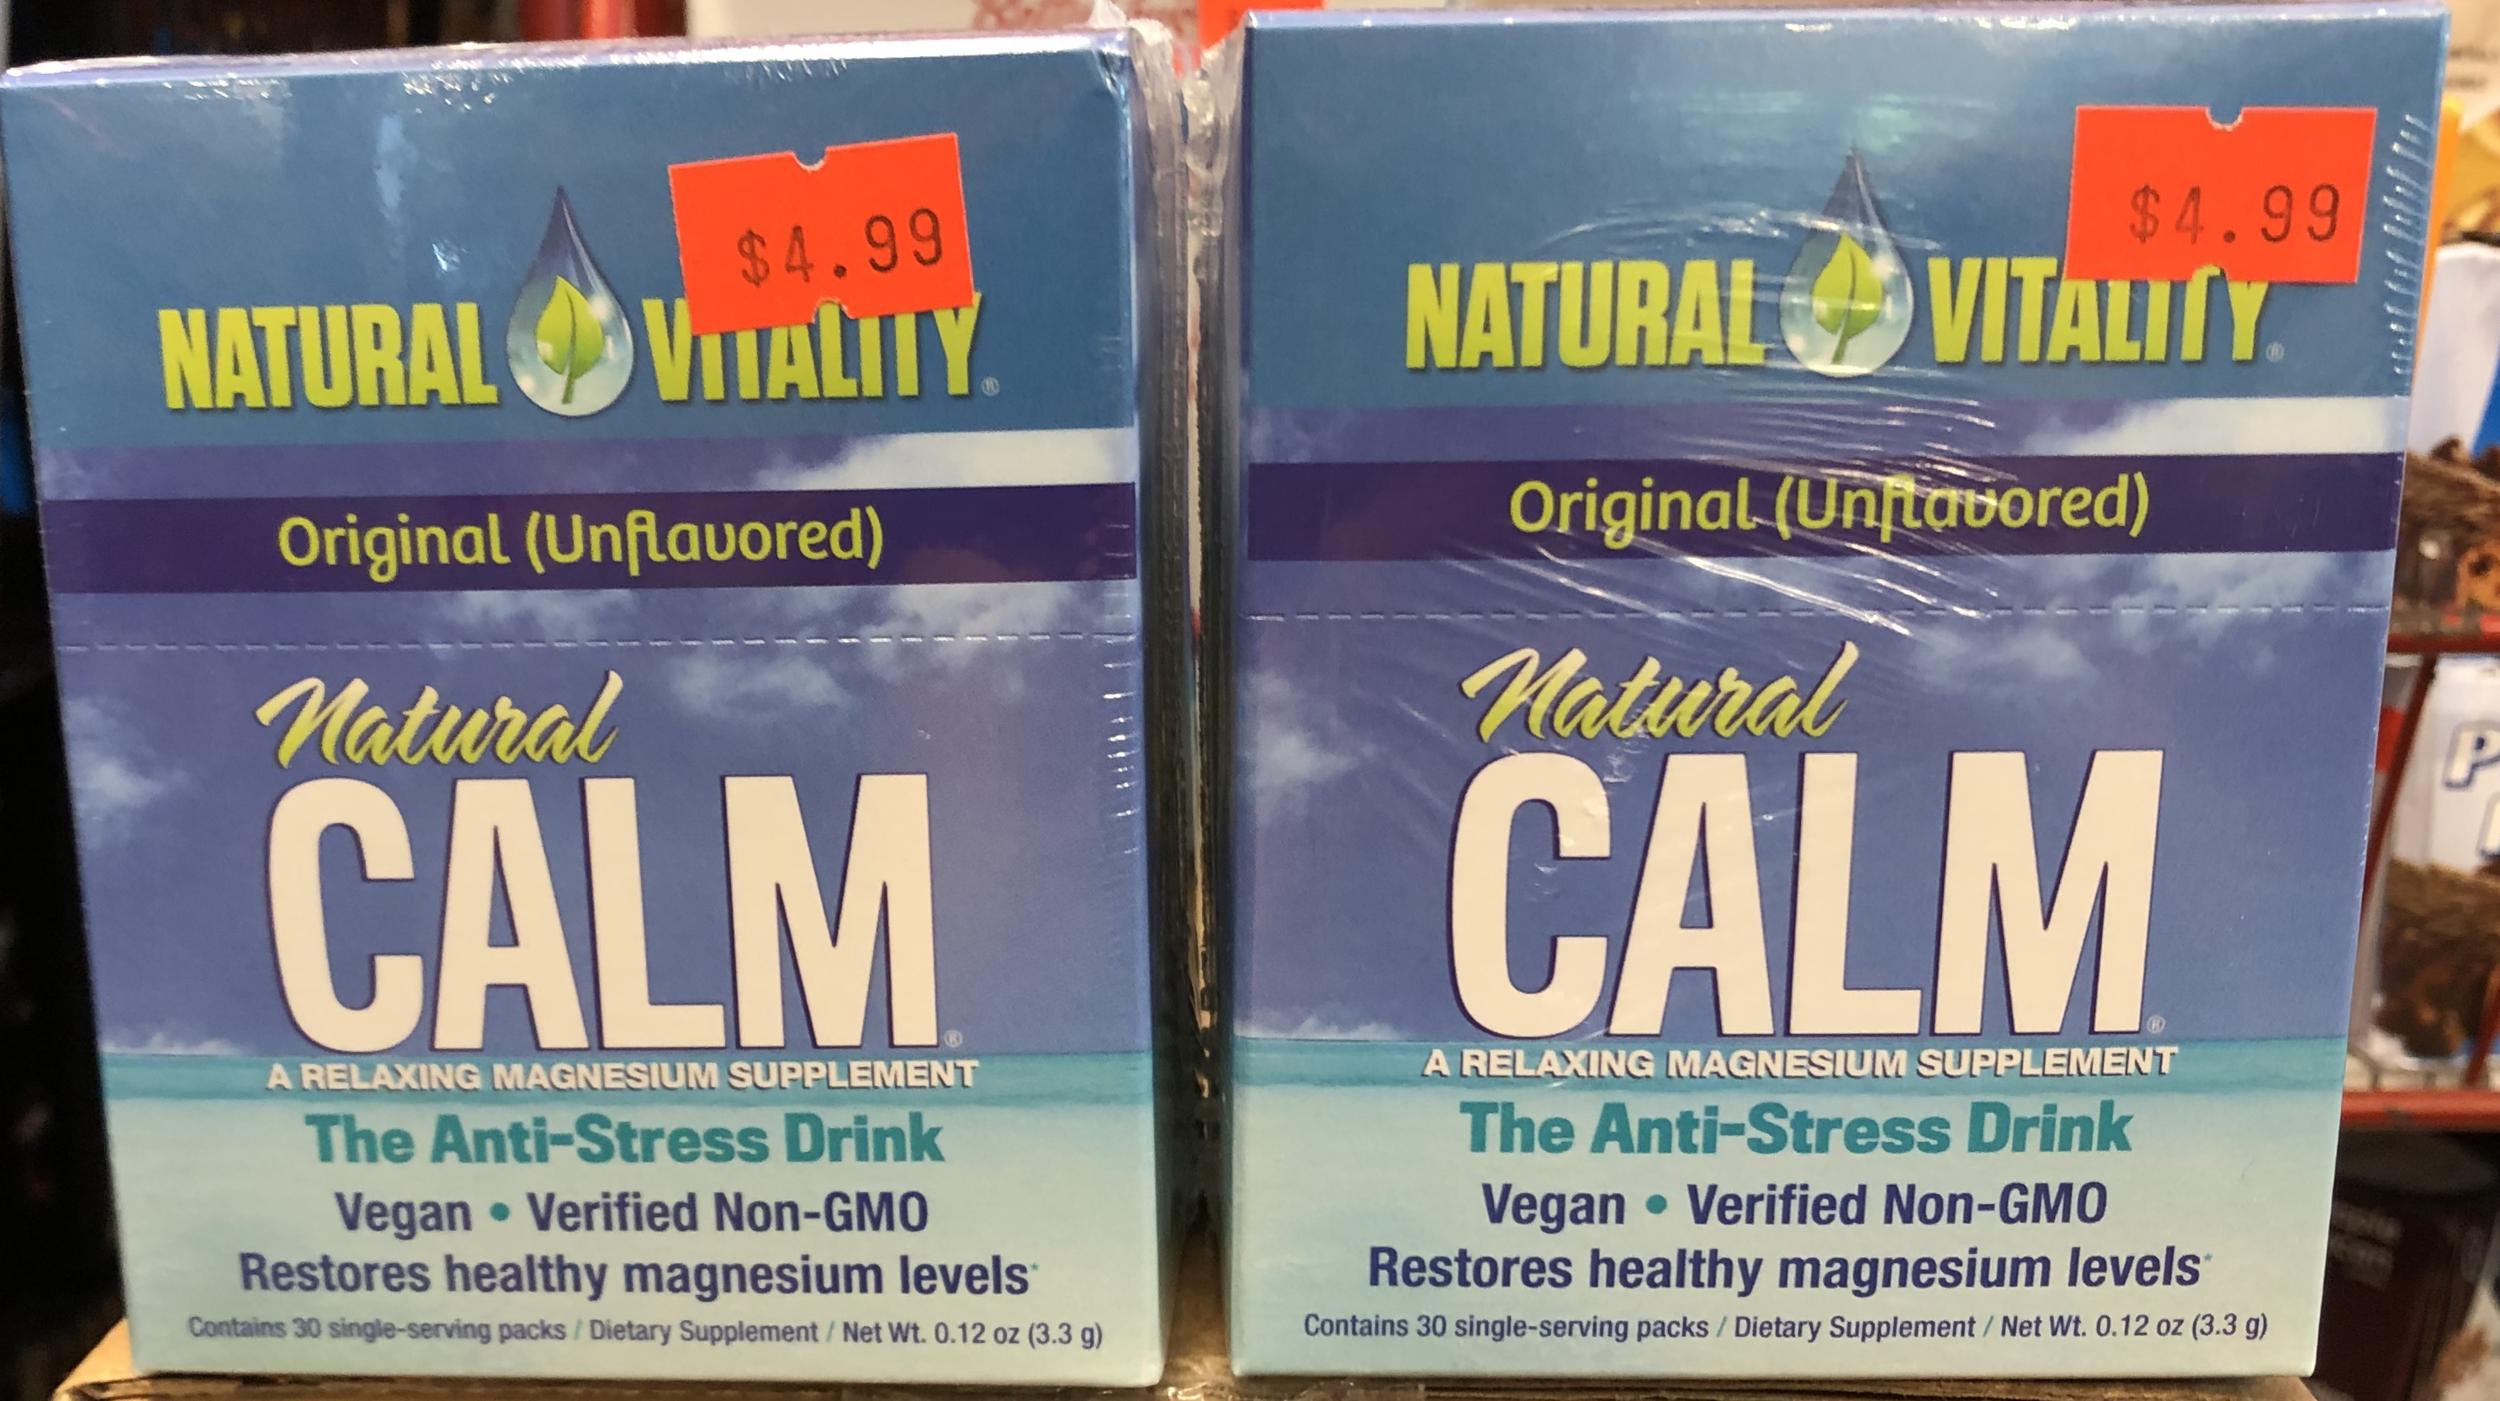 Natural Vitality Calm Anti-Stress Drink - Original